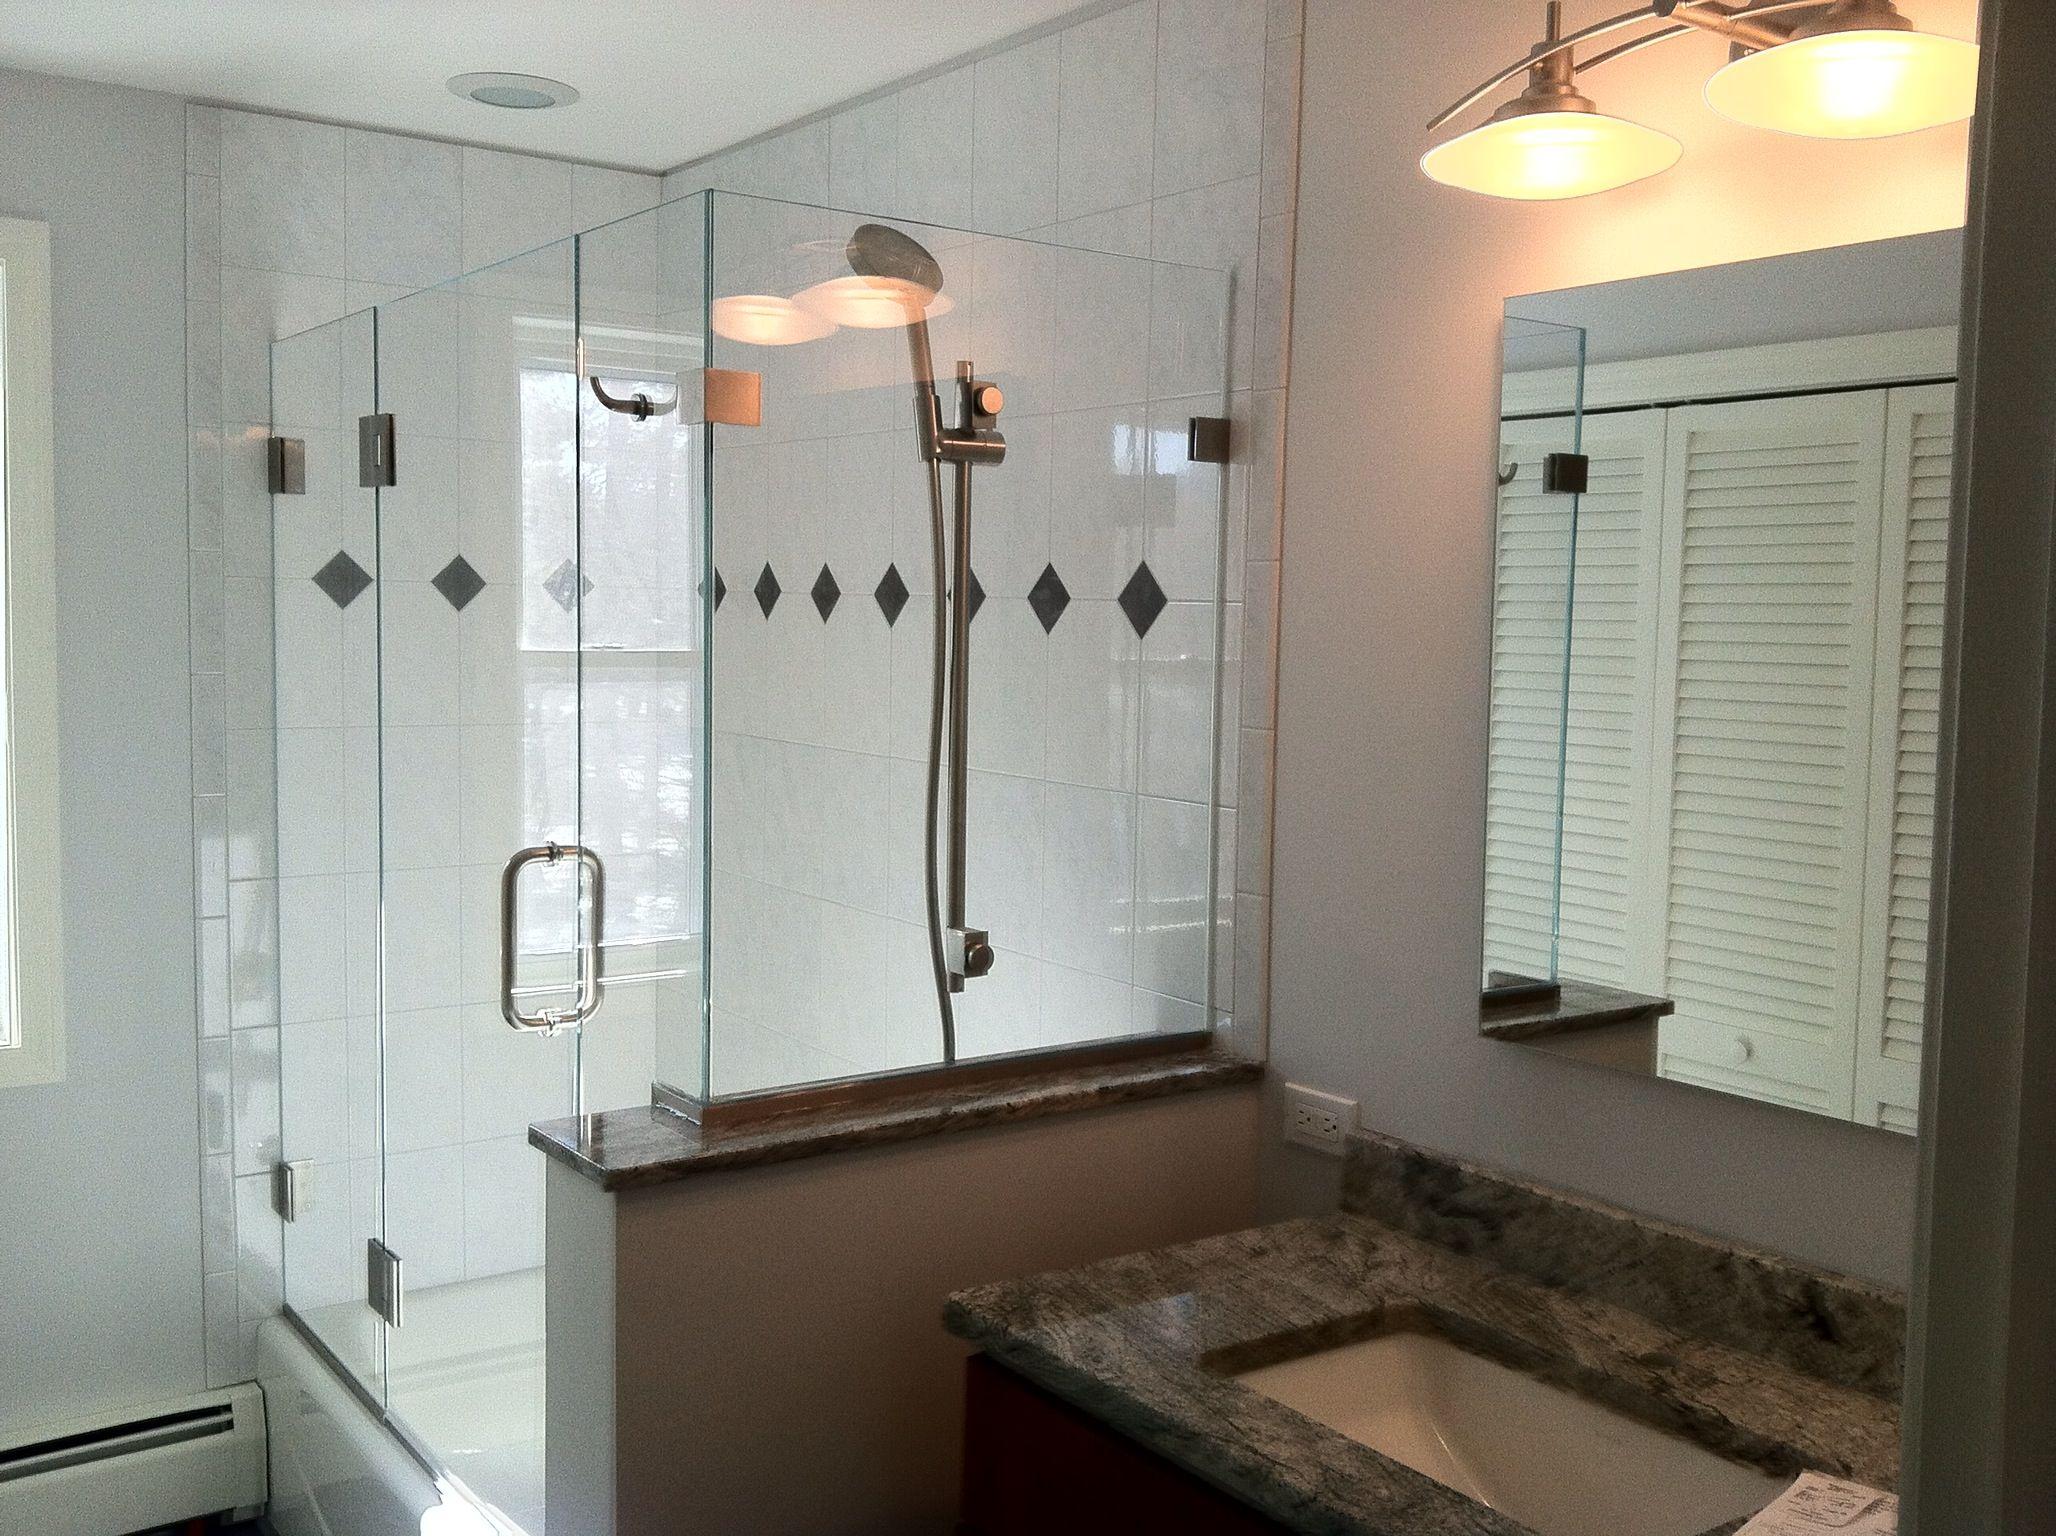 Shower Head Mounted Through Glass Glass Shower Tub Luxury